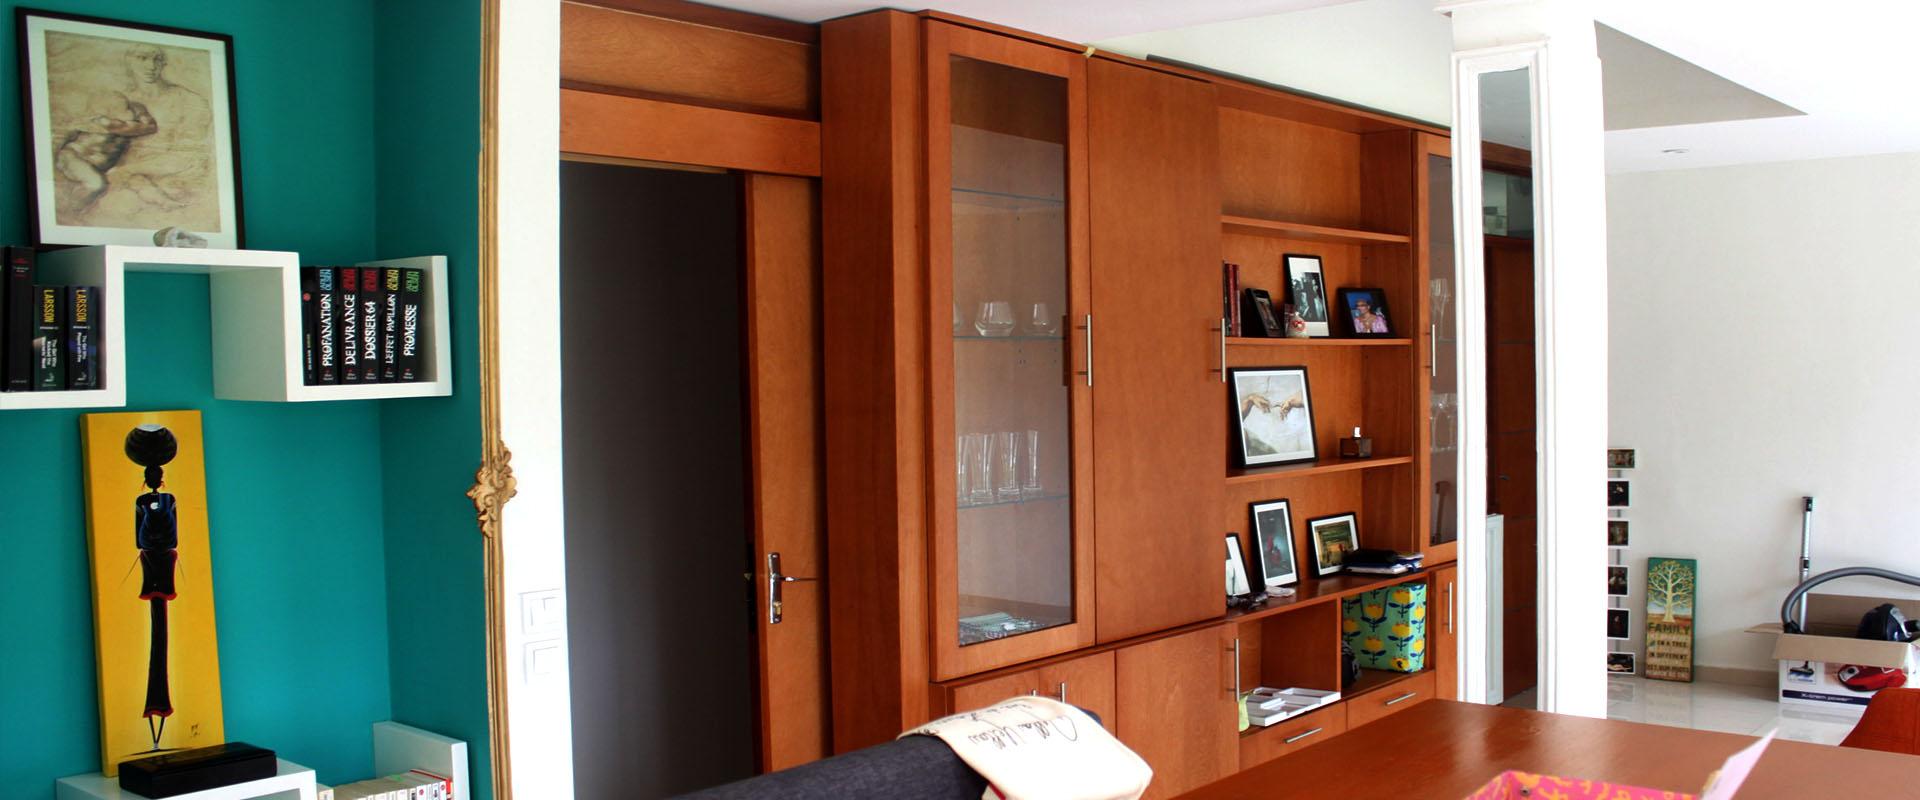 Villa FSP - 1_barla_architectes_douala_cameroun